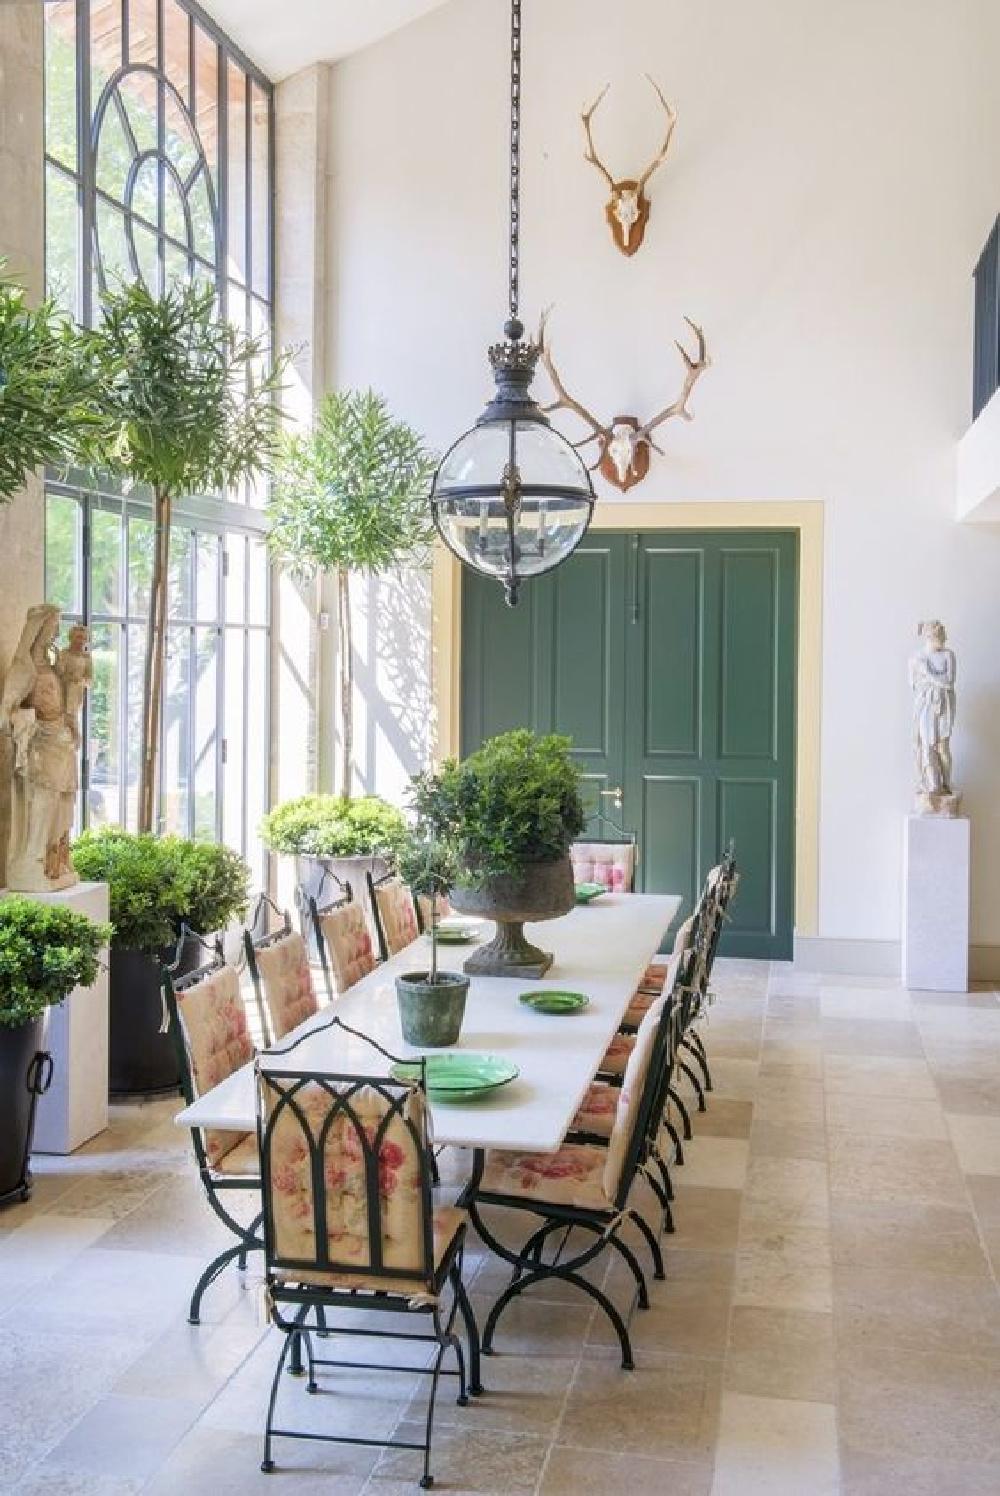 Exquisite orangery in a Provence French farmhouse (Le Mas des Poiriers).